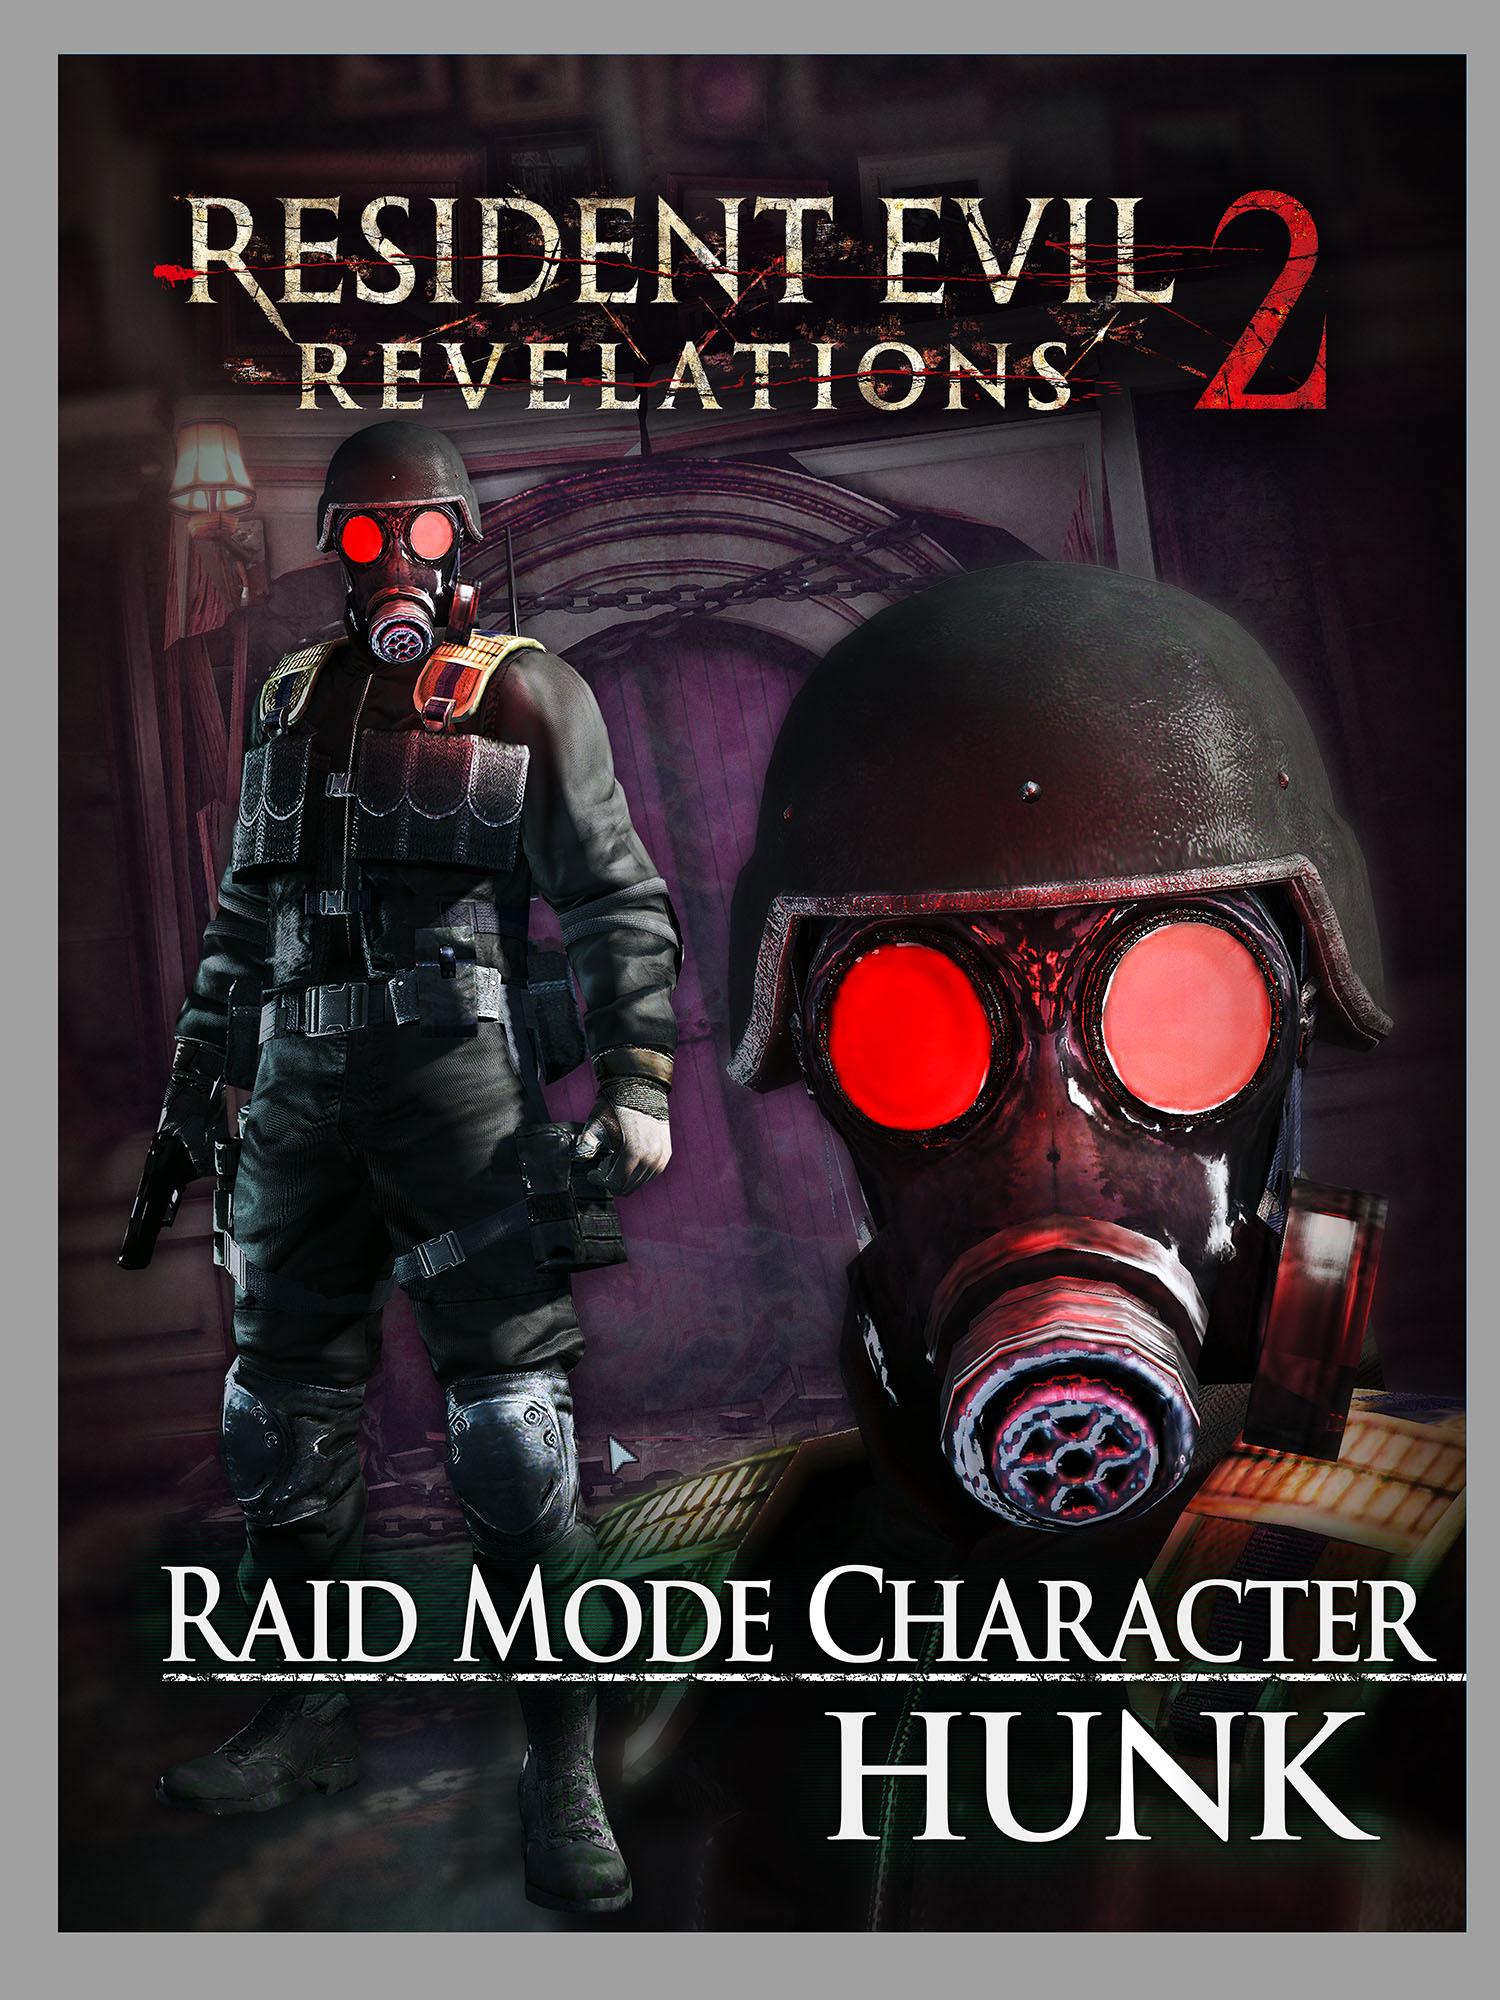 Raid Character Hunk